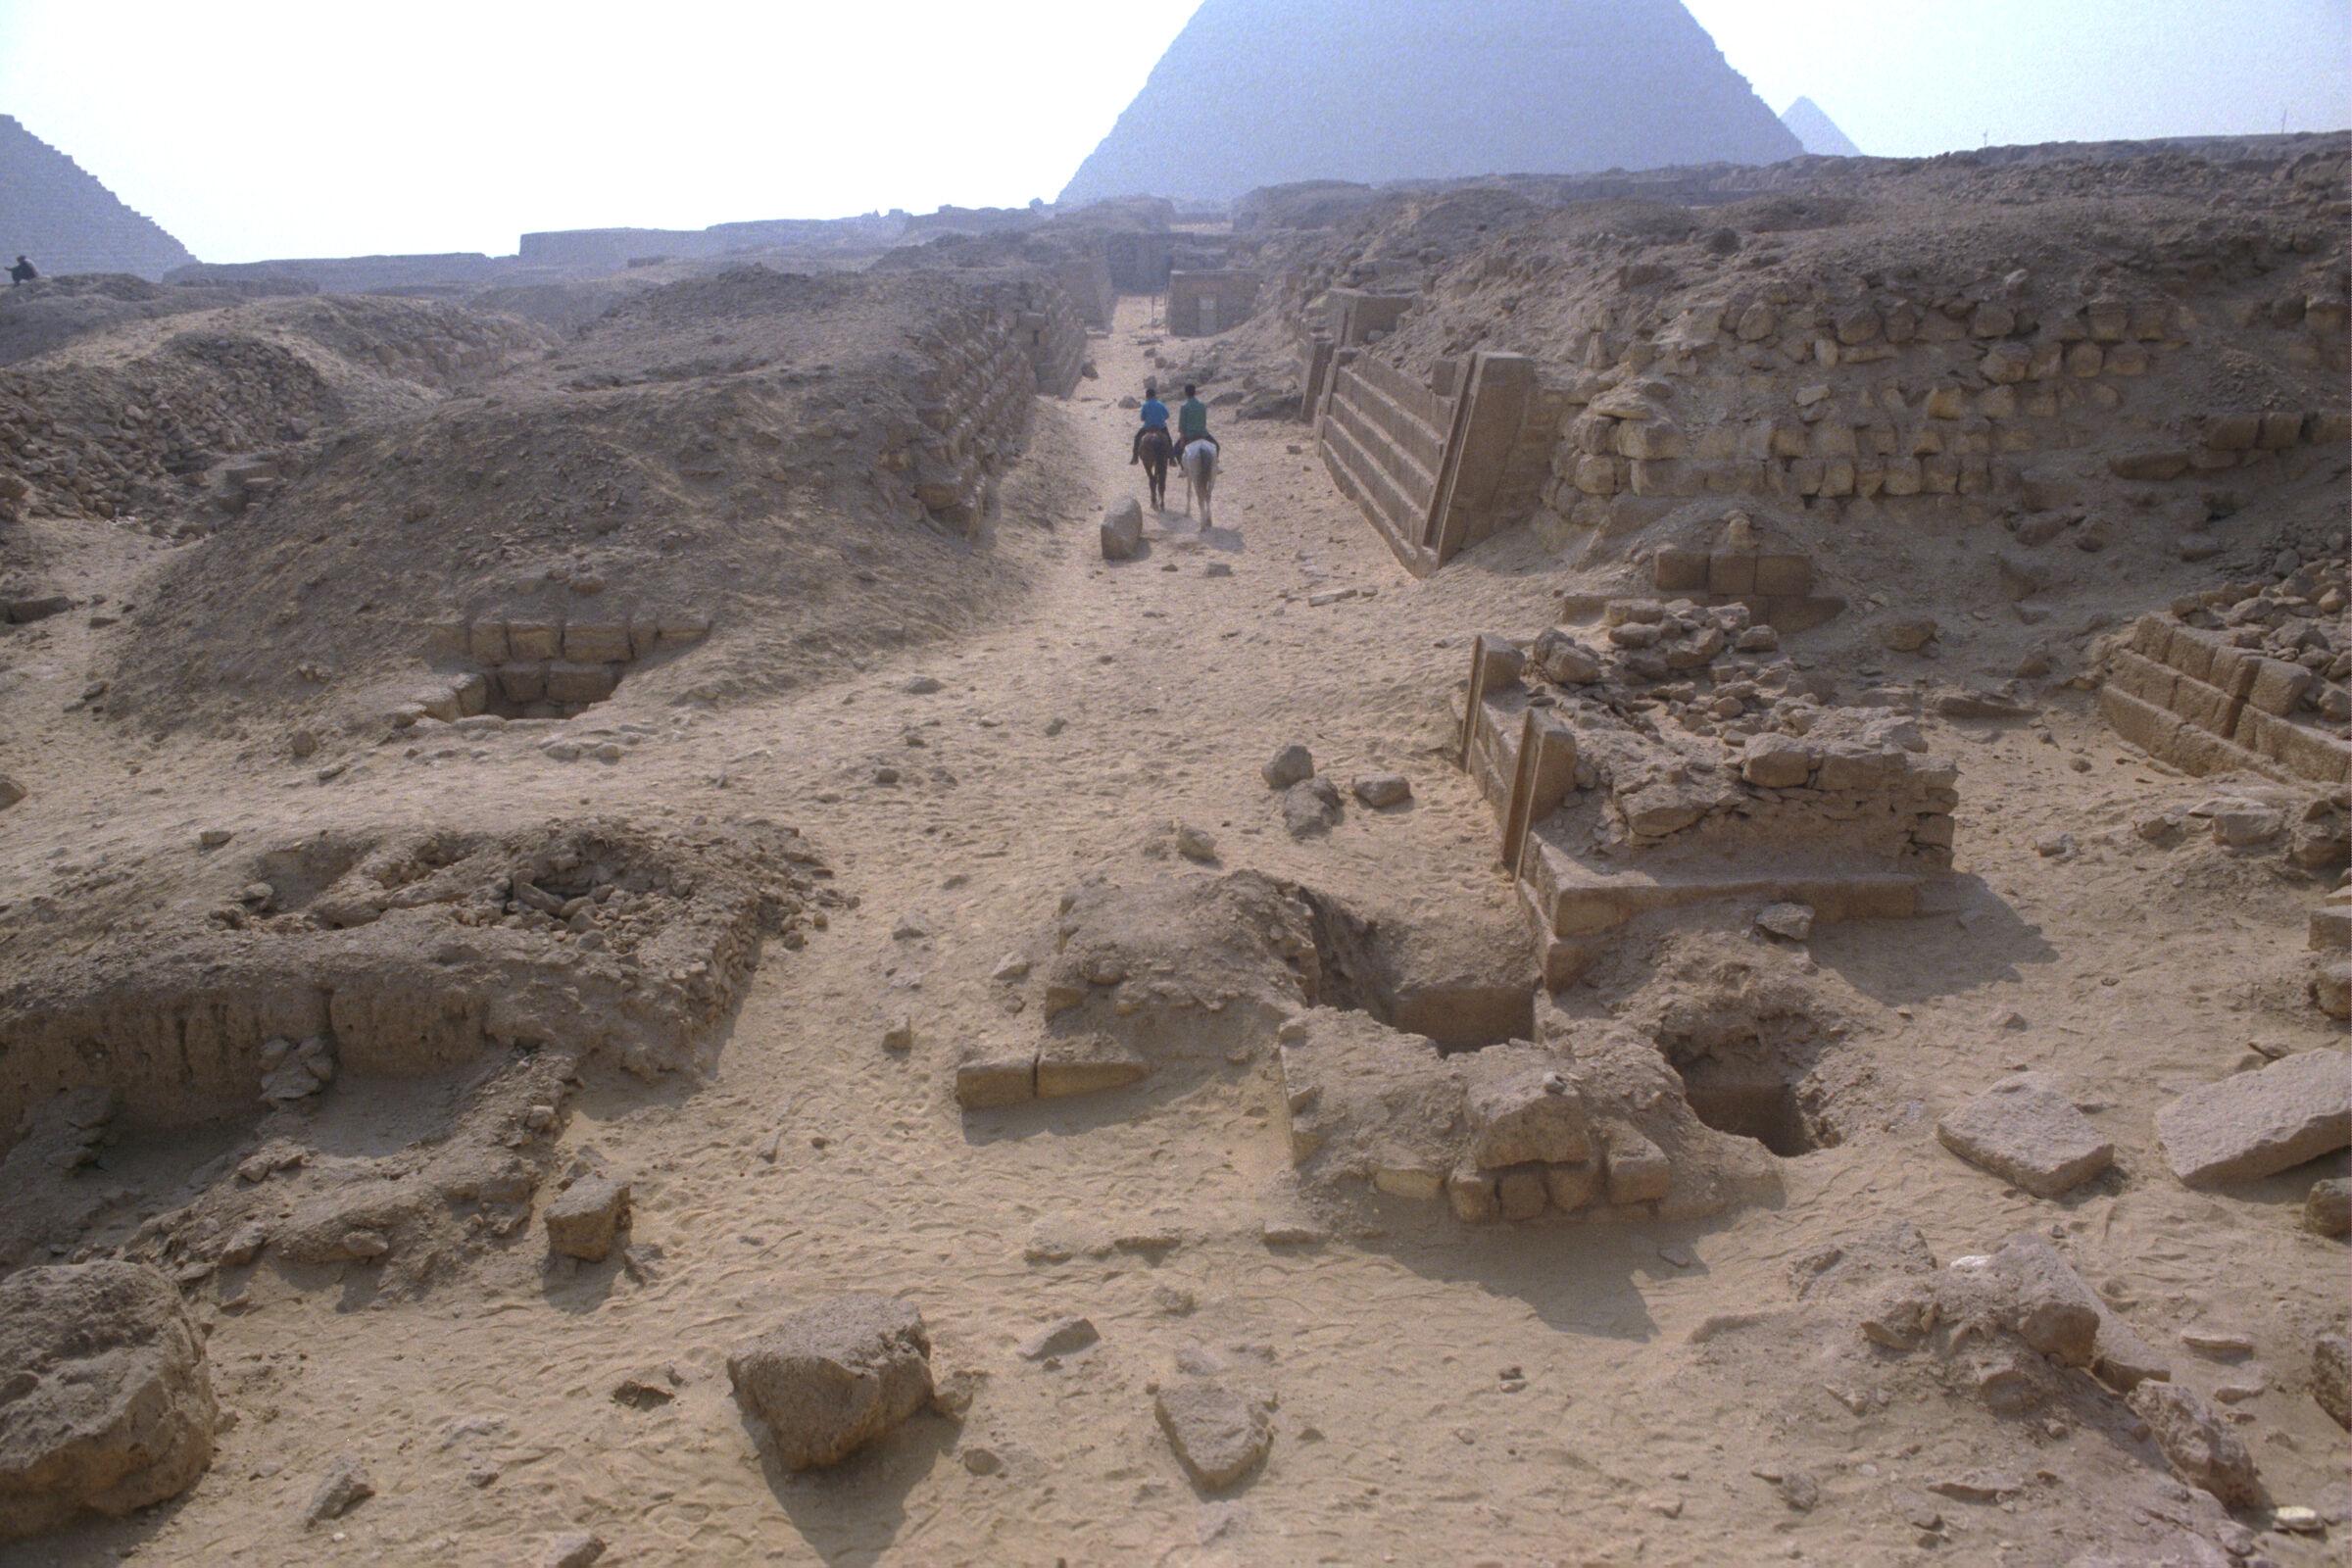 Western Cemetery: Site: Giza; View: G 2150, G 2151, G 2154, G 2154a, G 2153, G 2152, G 2136', G 2157, G 2170